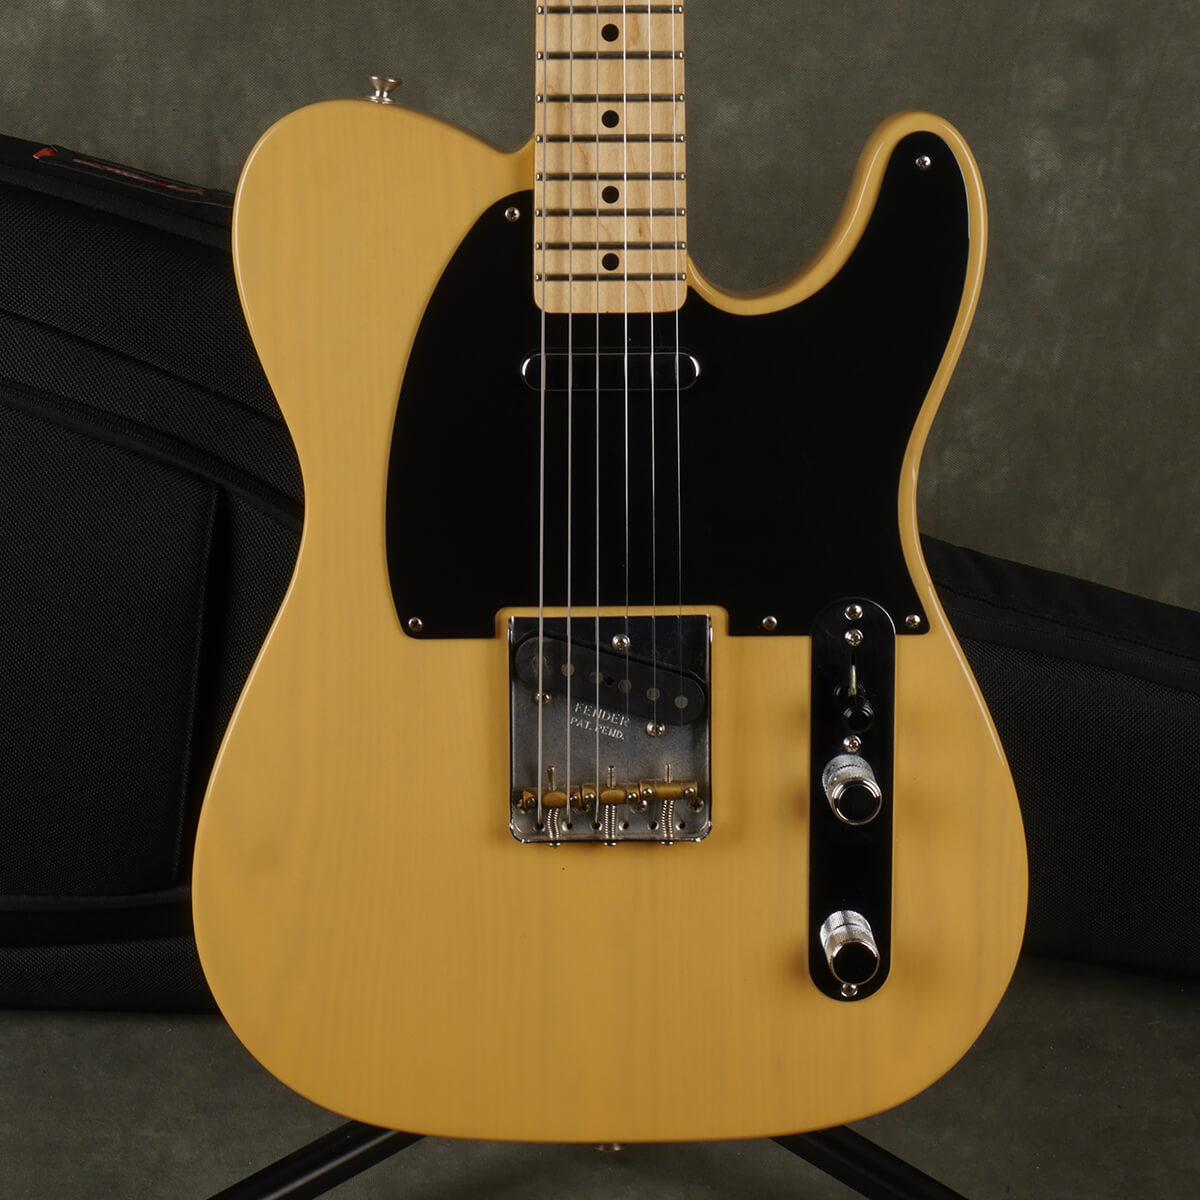 Fender Baja Telecaster - Butterscotch Blonde w/Gig Bag - 2nd Hand